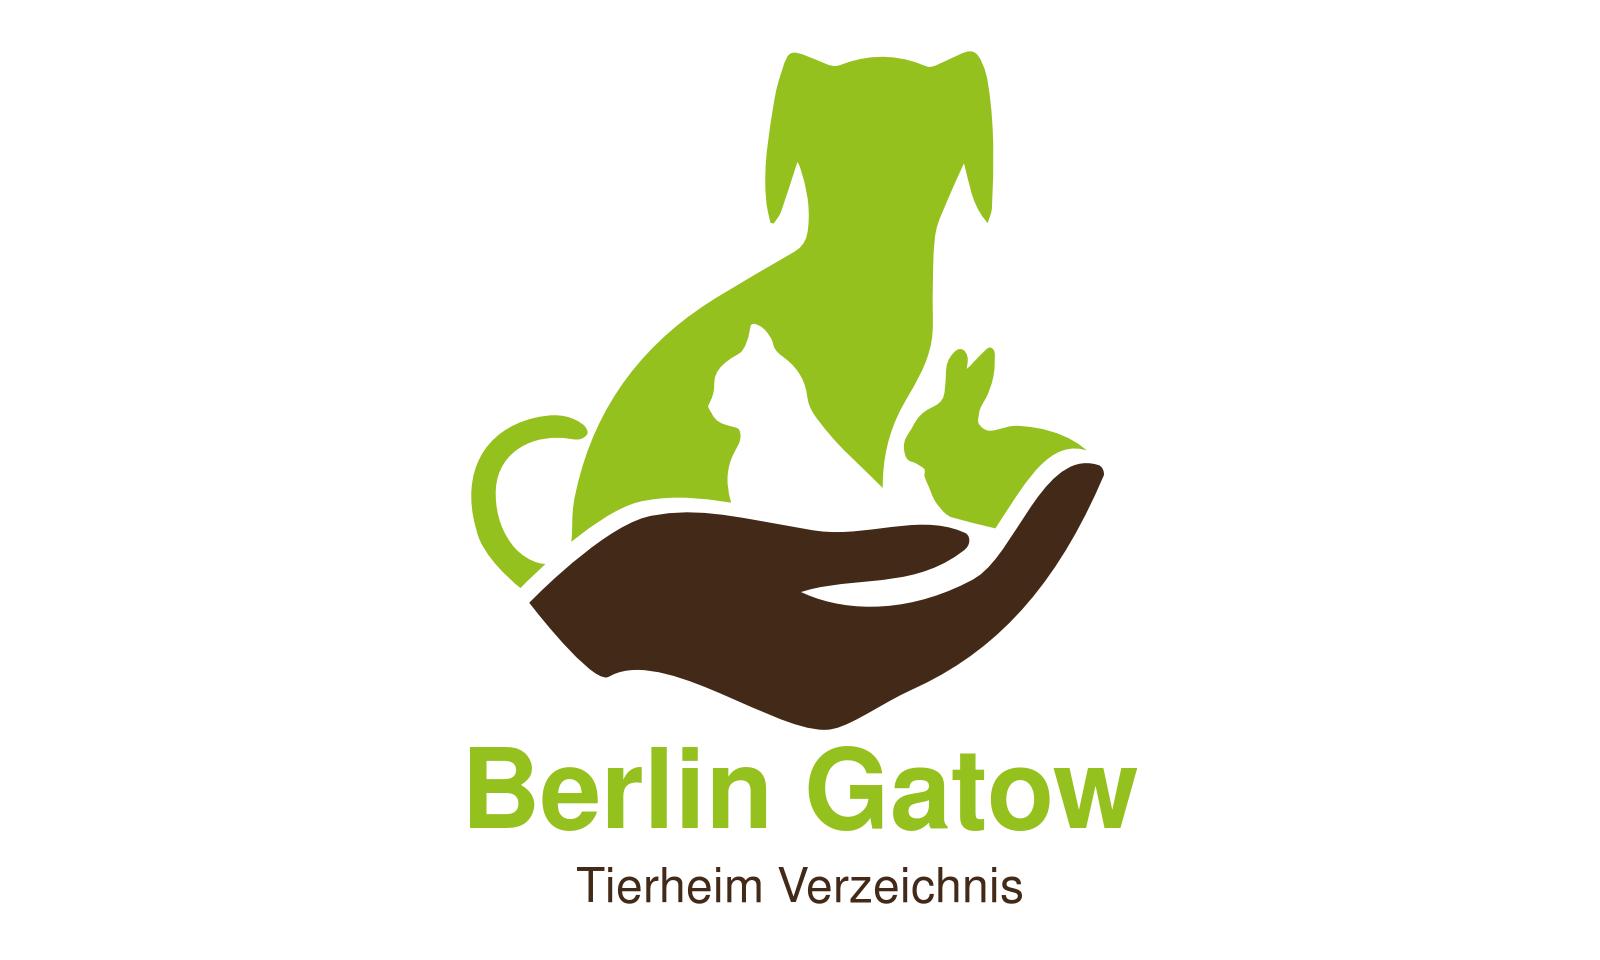 Tierheim Berlin Gatow